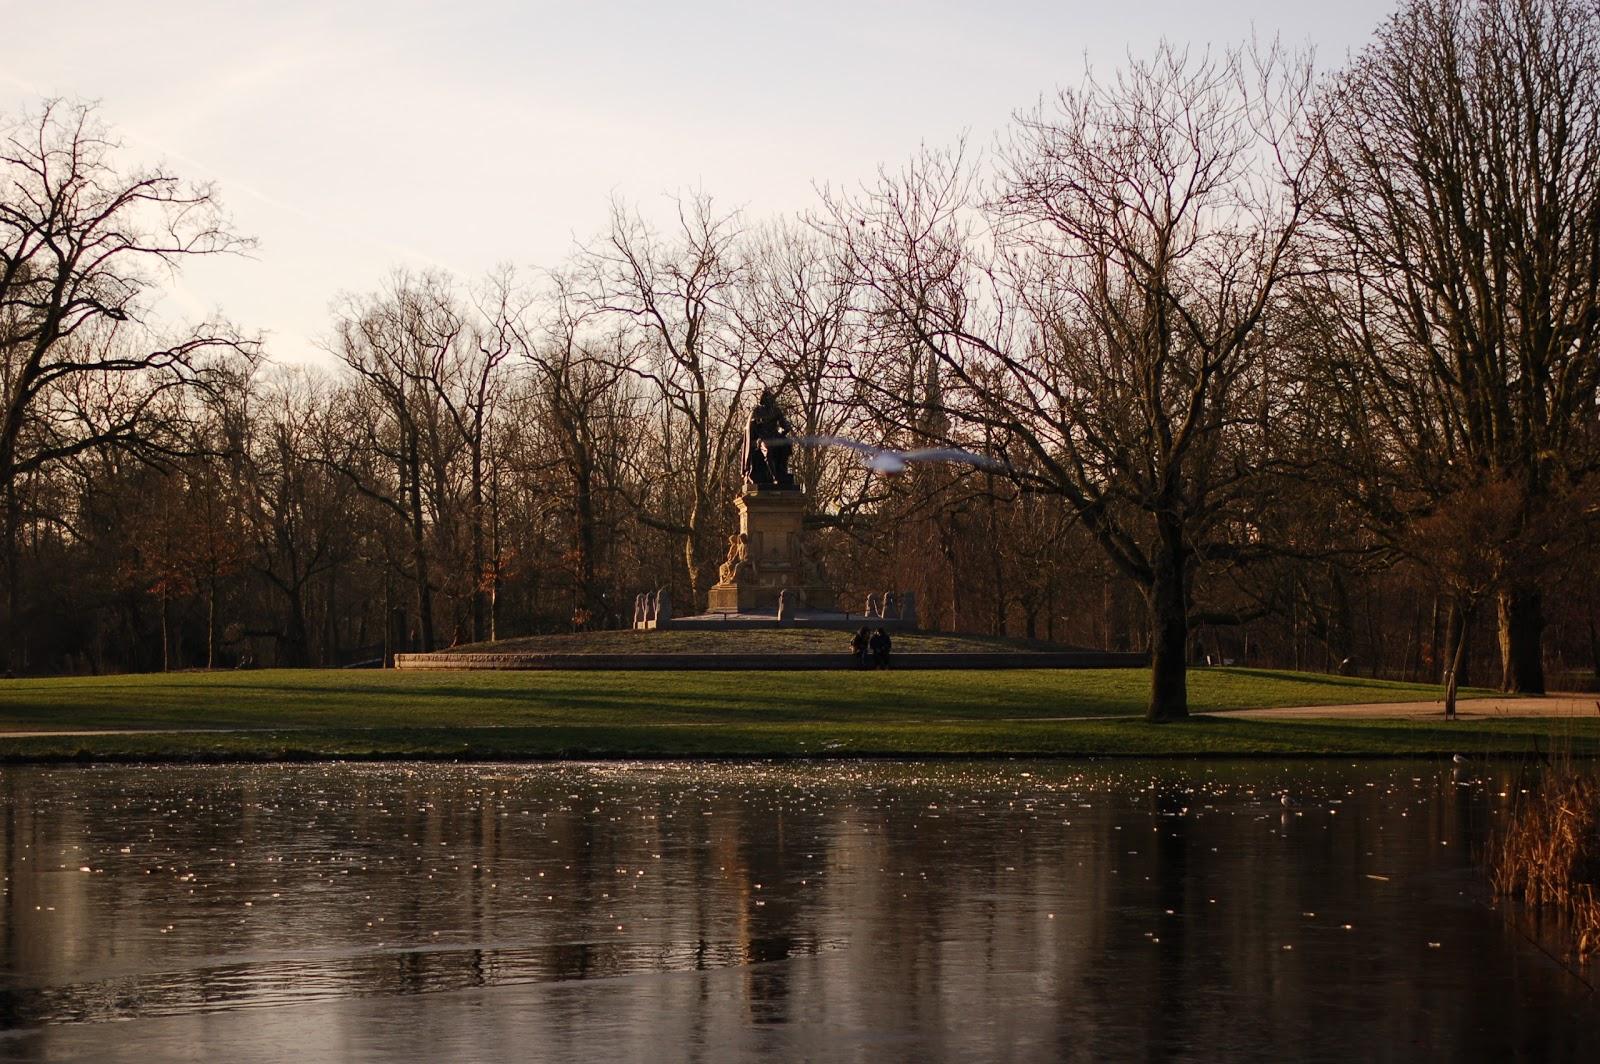 vondelpark amsterda inverno